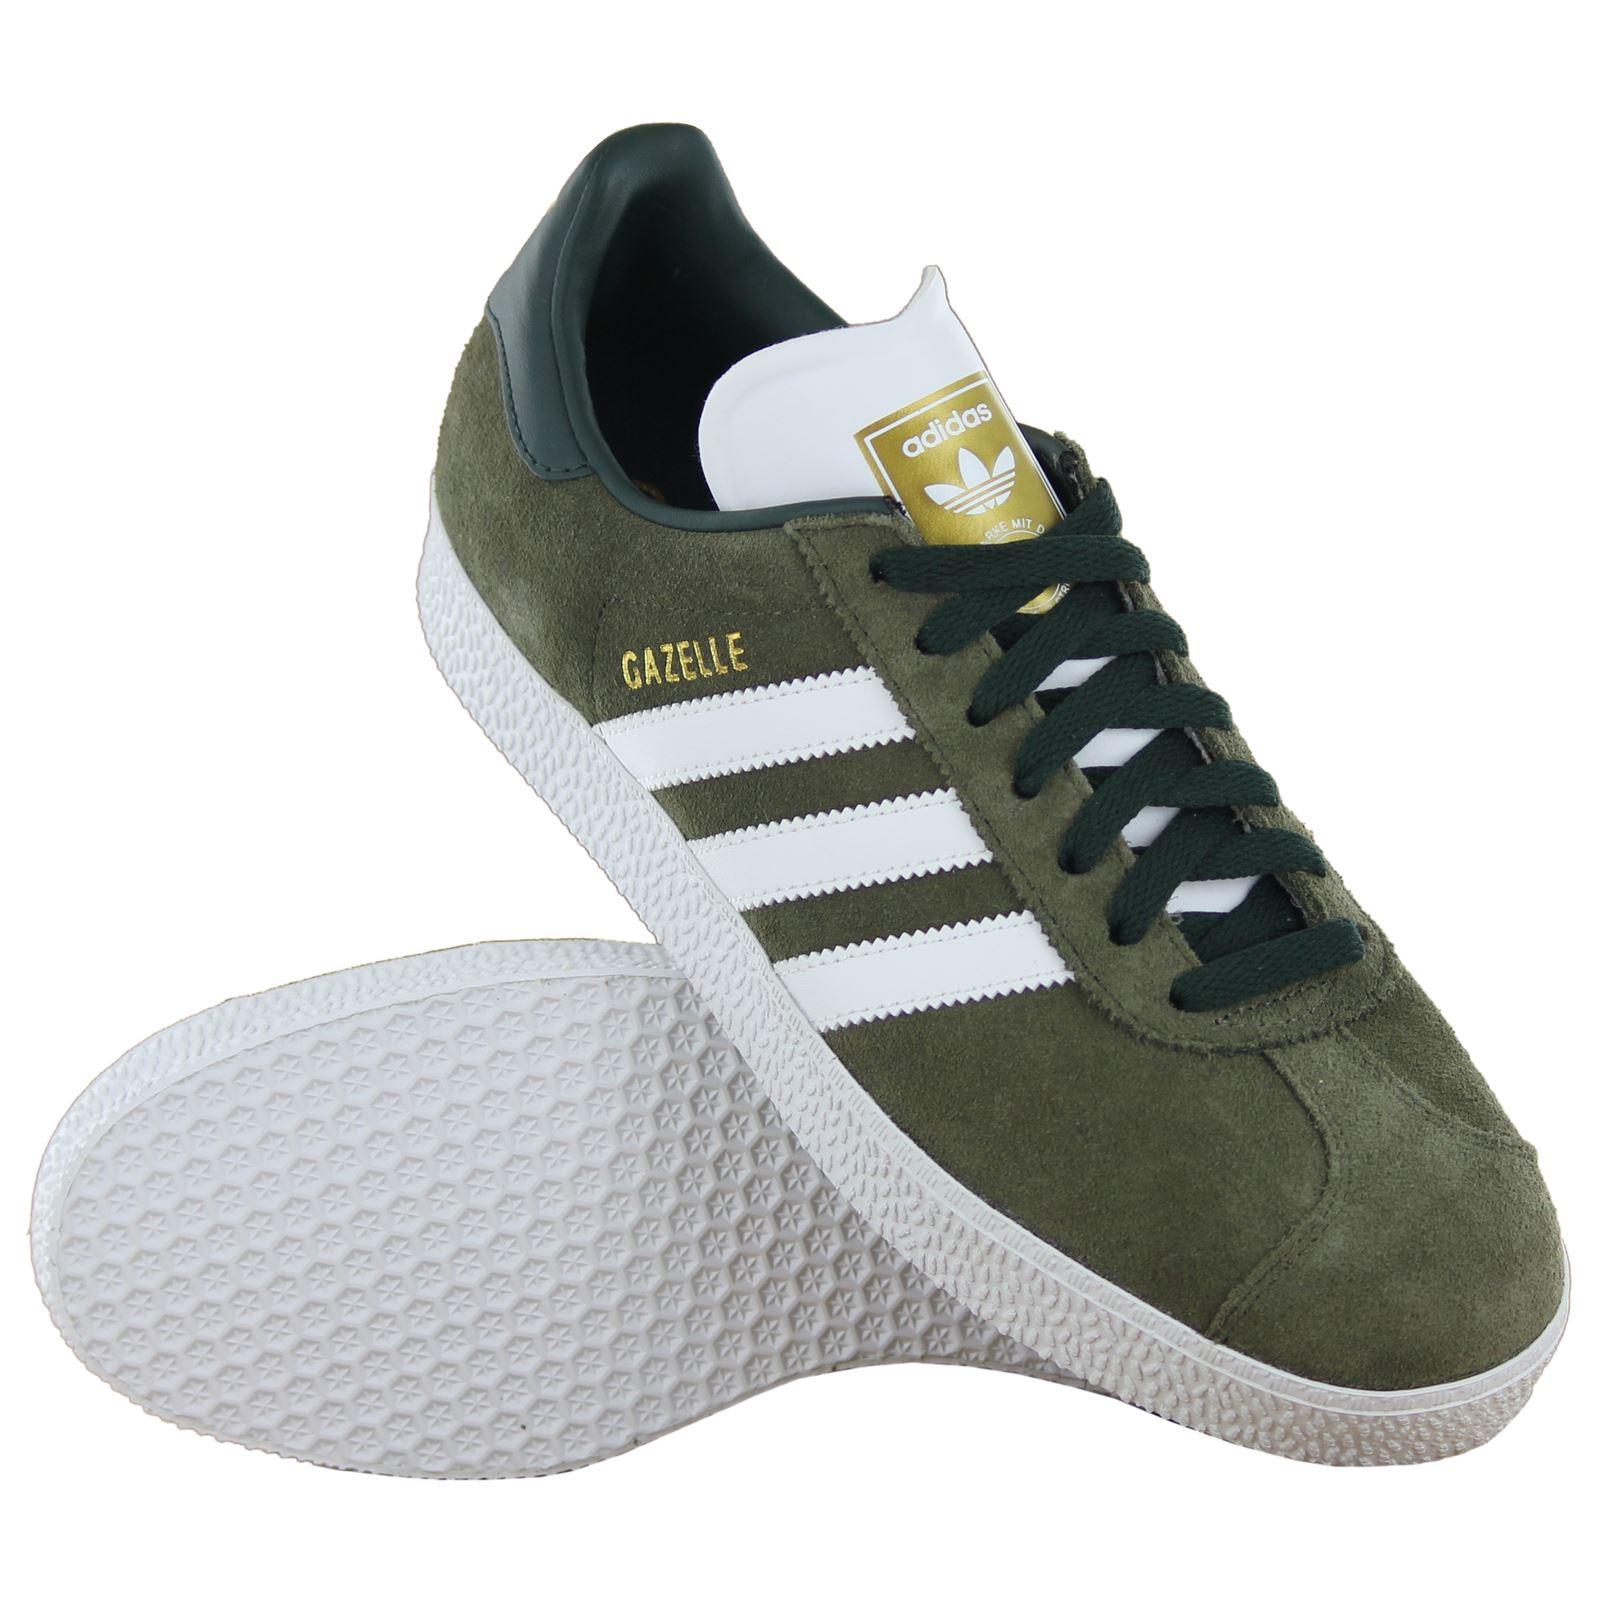 adidas gazelle verdi donna